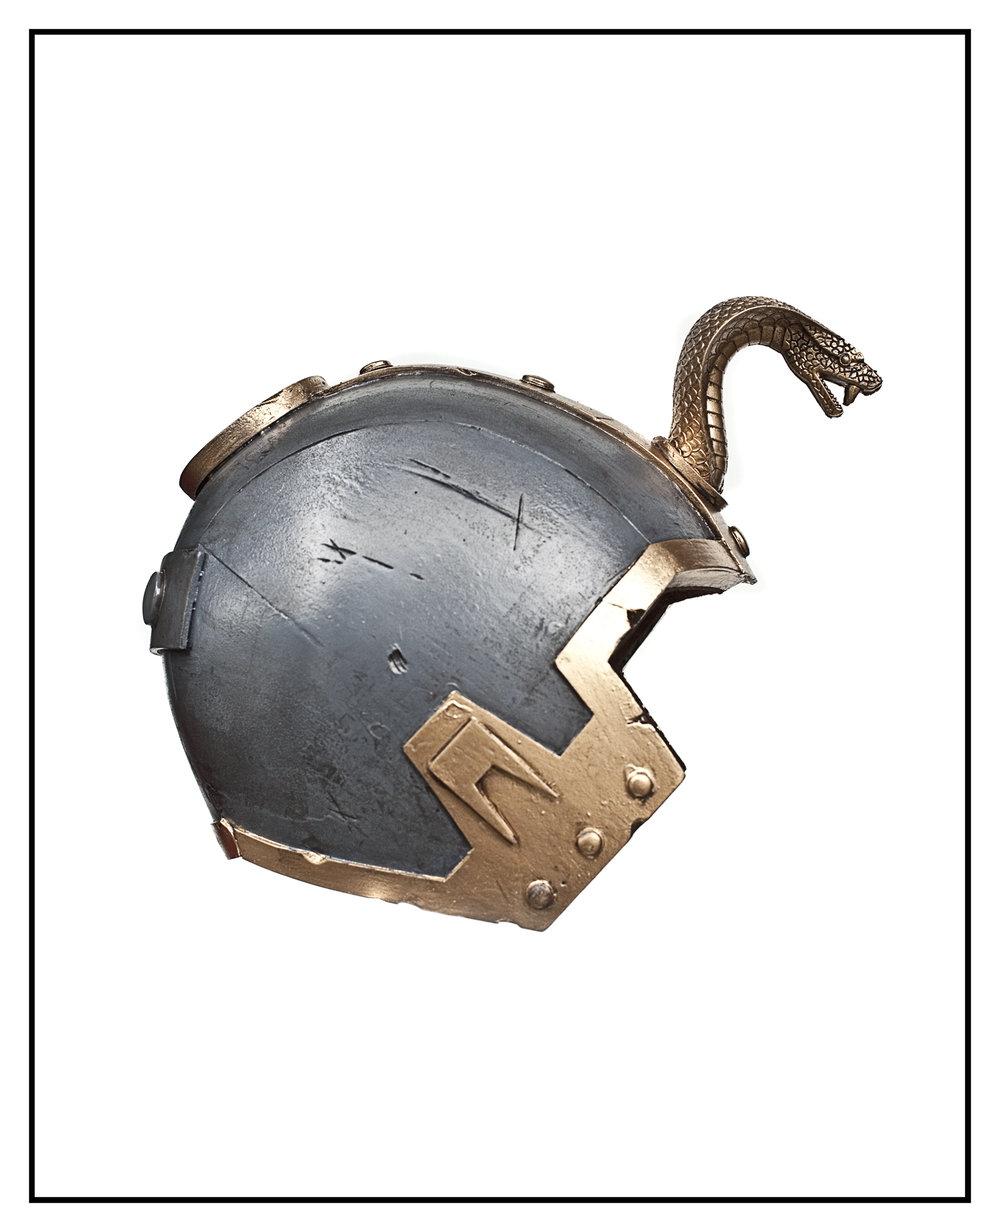 hyborian helmet.jpg